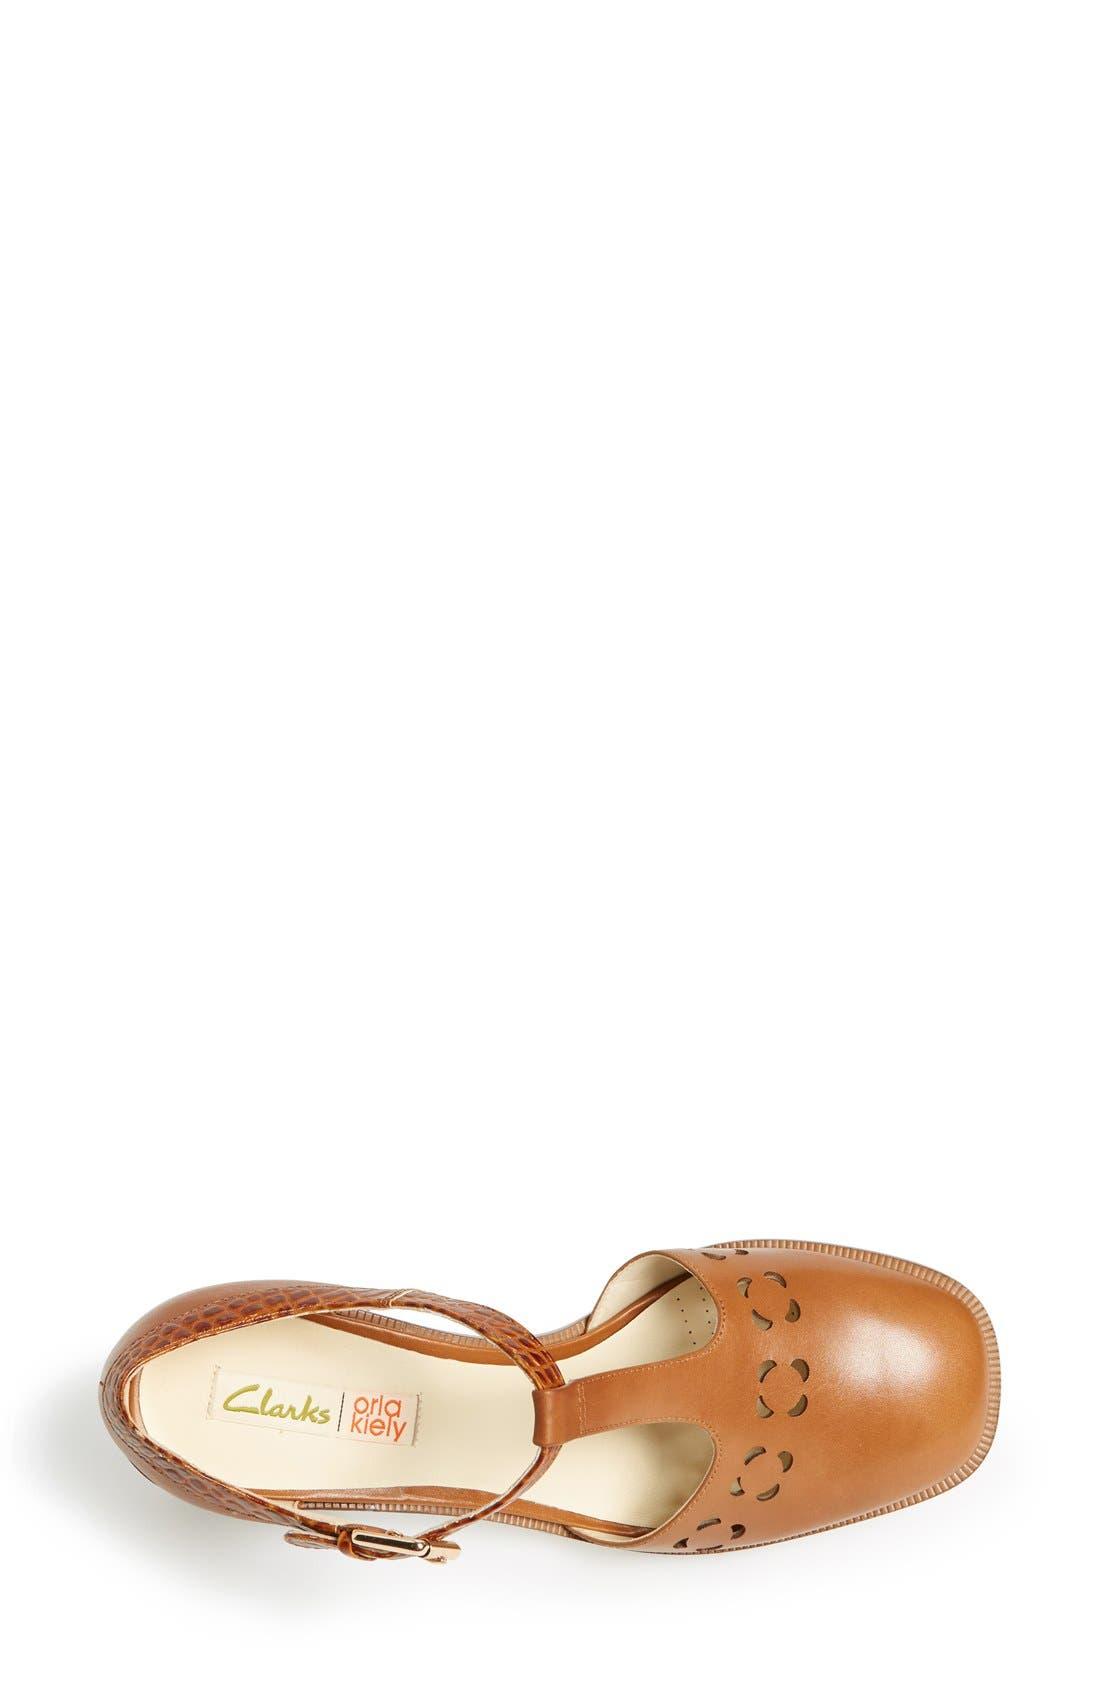 Clarks<sup>®</sup> x Orla Kiely 'Bibi' Leather T-Strap Sandal,                             Alternate thumbnail 2, color,                             200